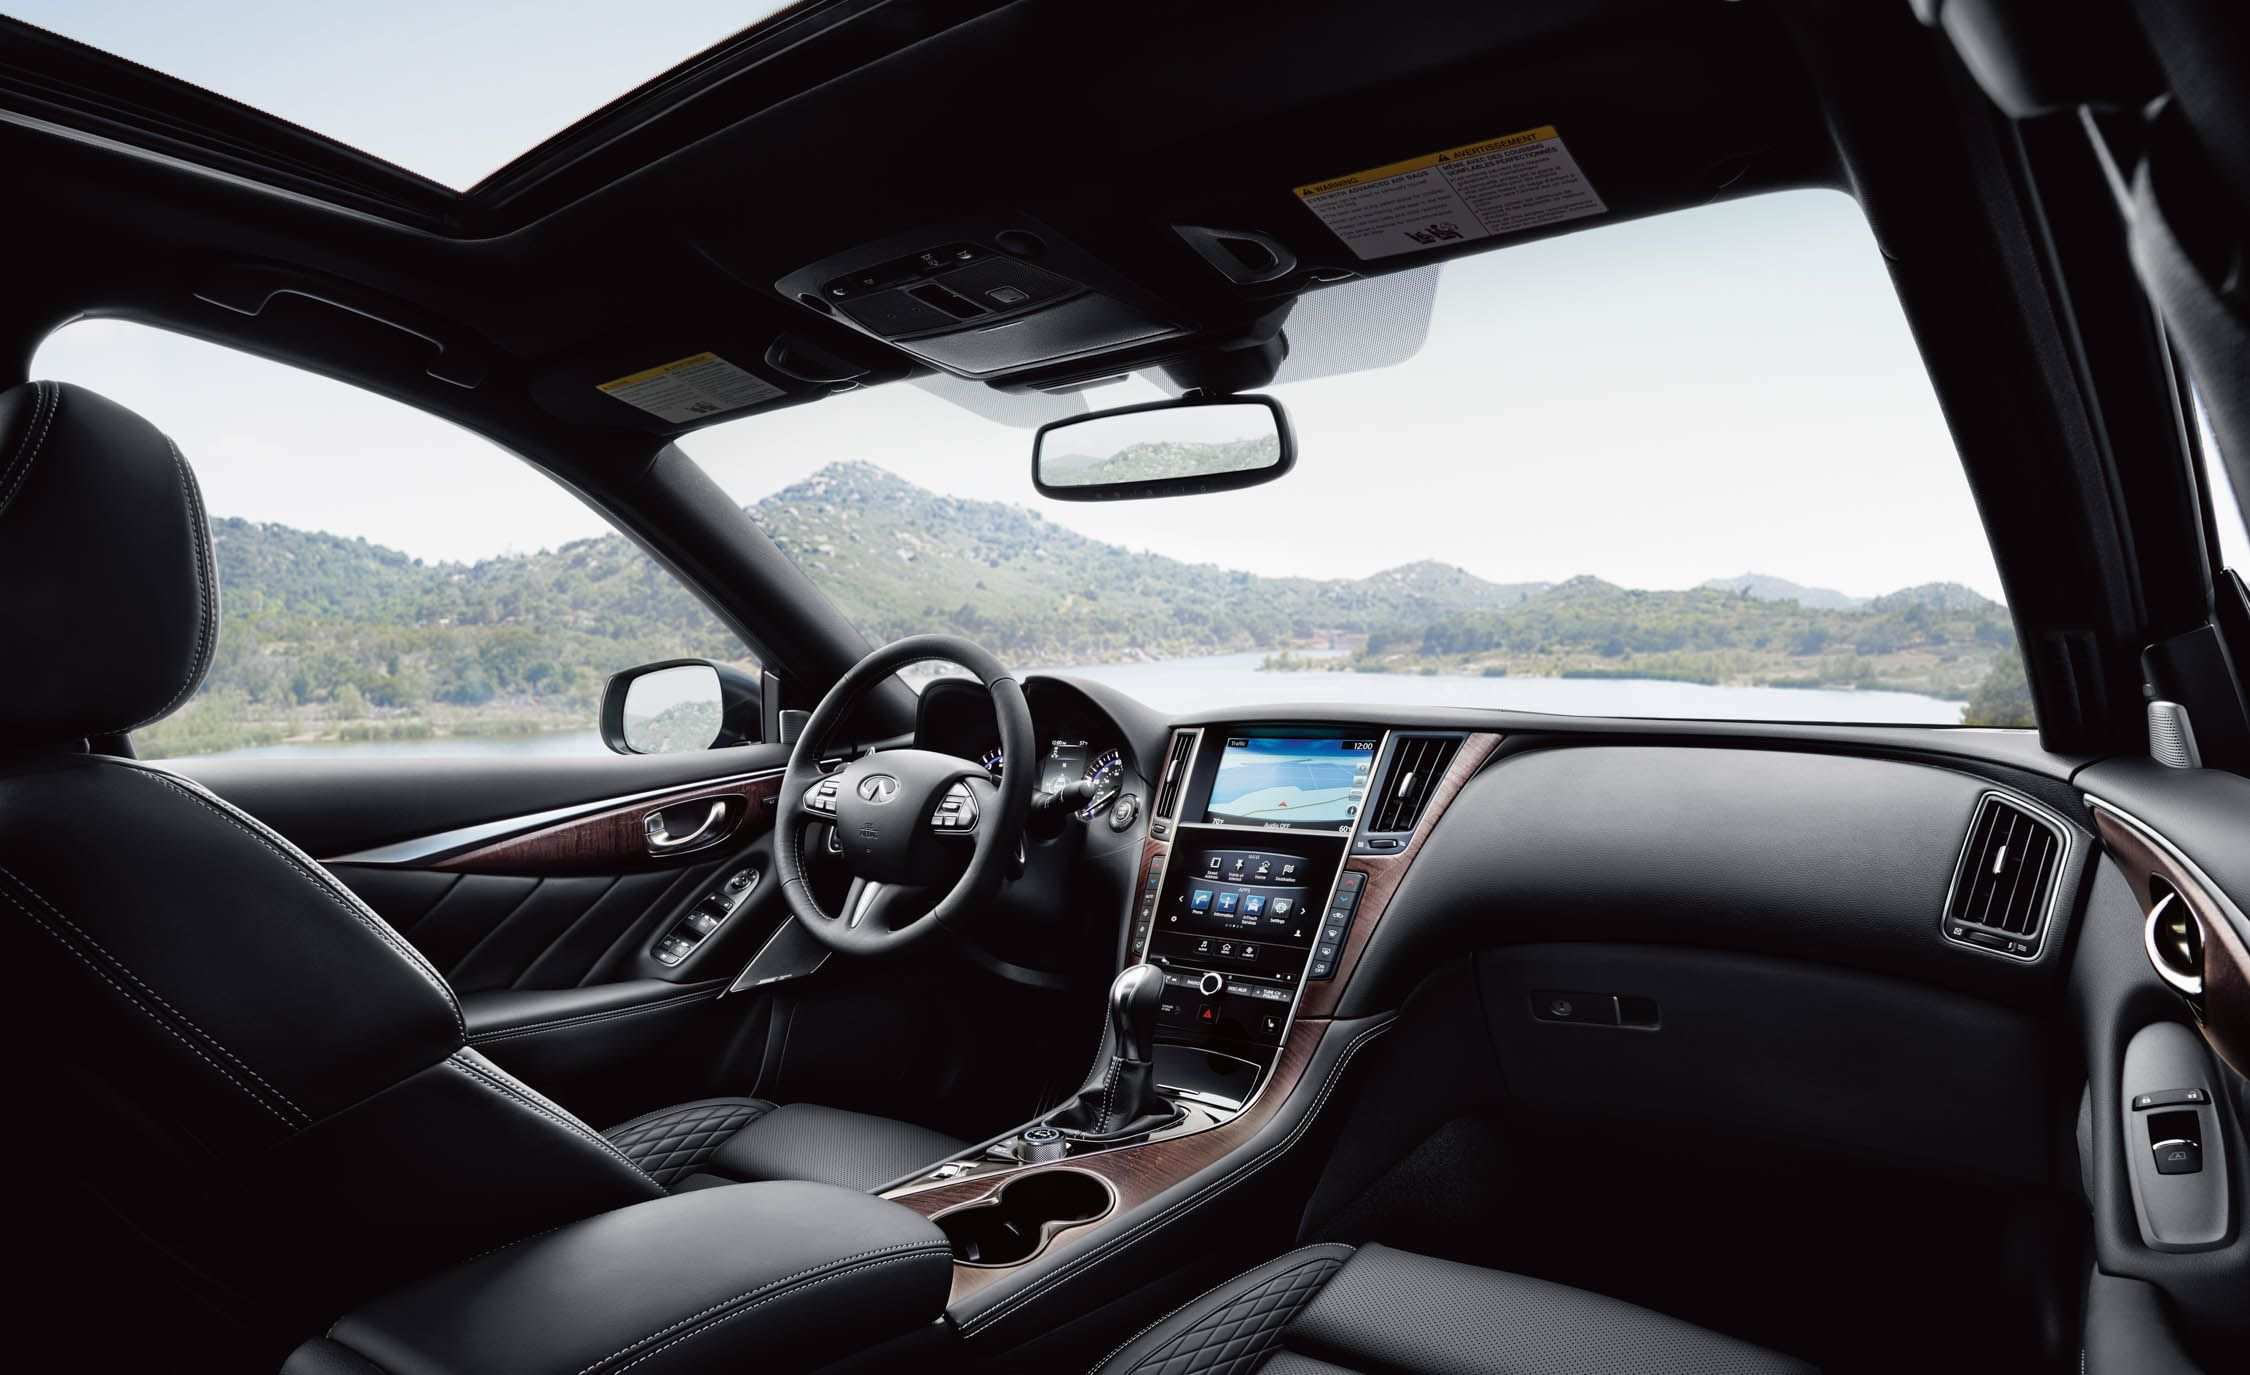 37 Concept of Infiniti Q50 2019 Interior Engine Price by Infiniti Q50 2019 Interior Engine